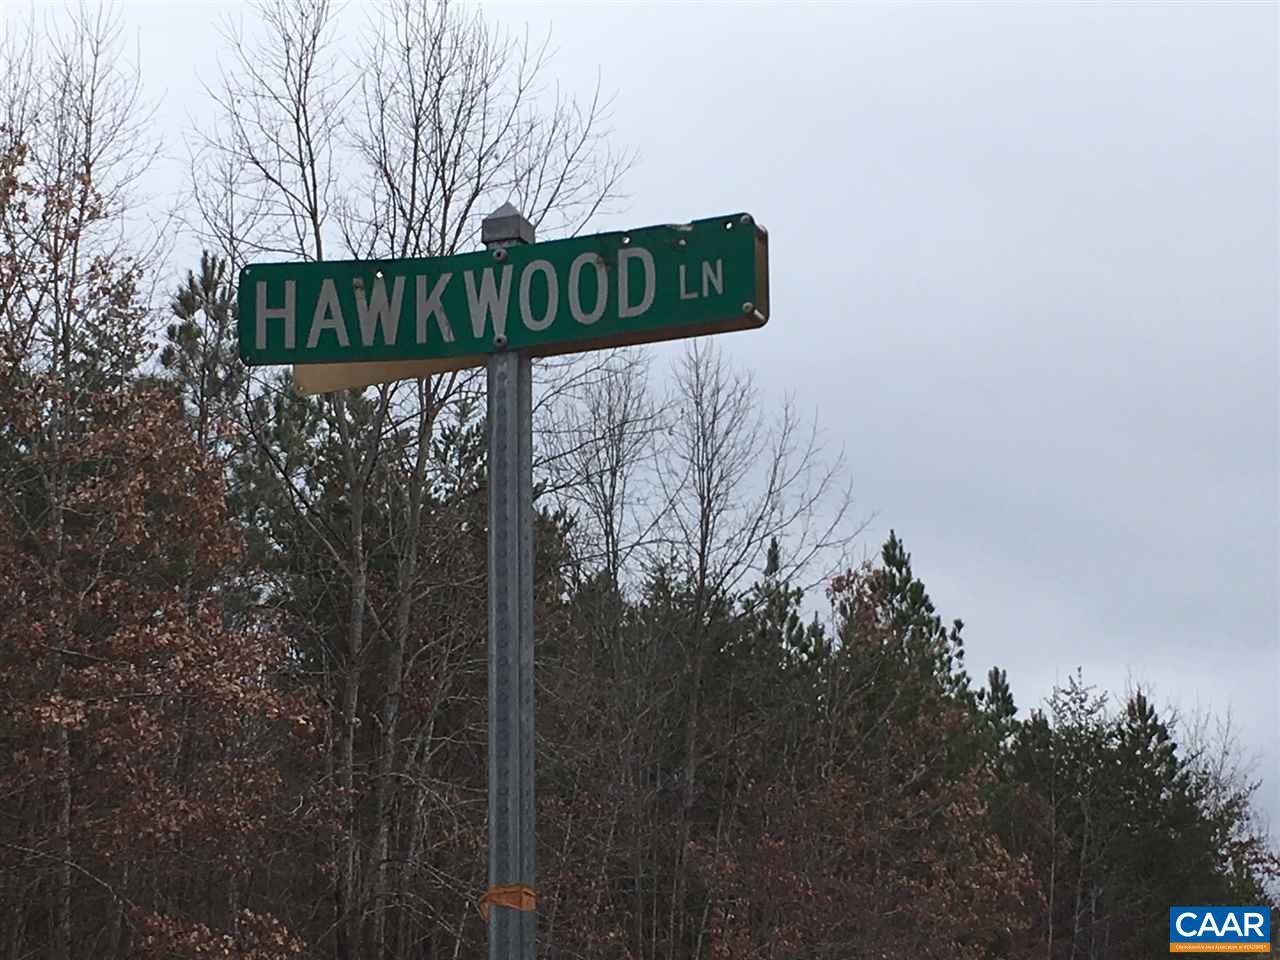 land for sale , MLS #572285, 1 Hawkwood Ln